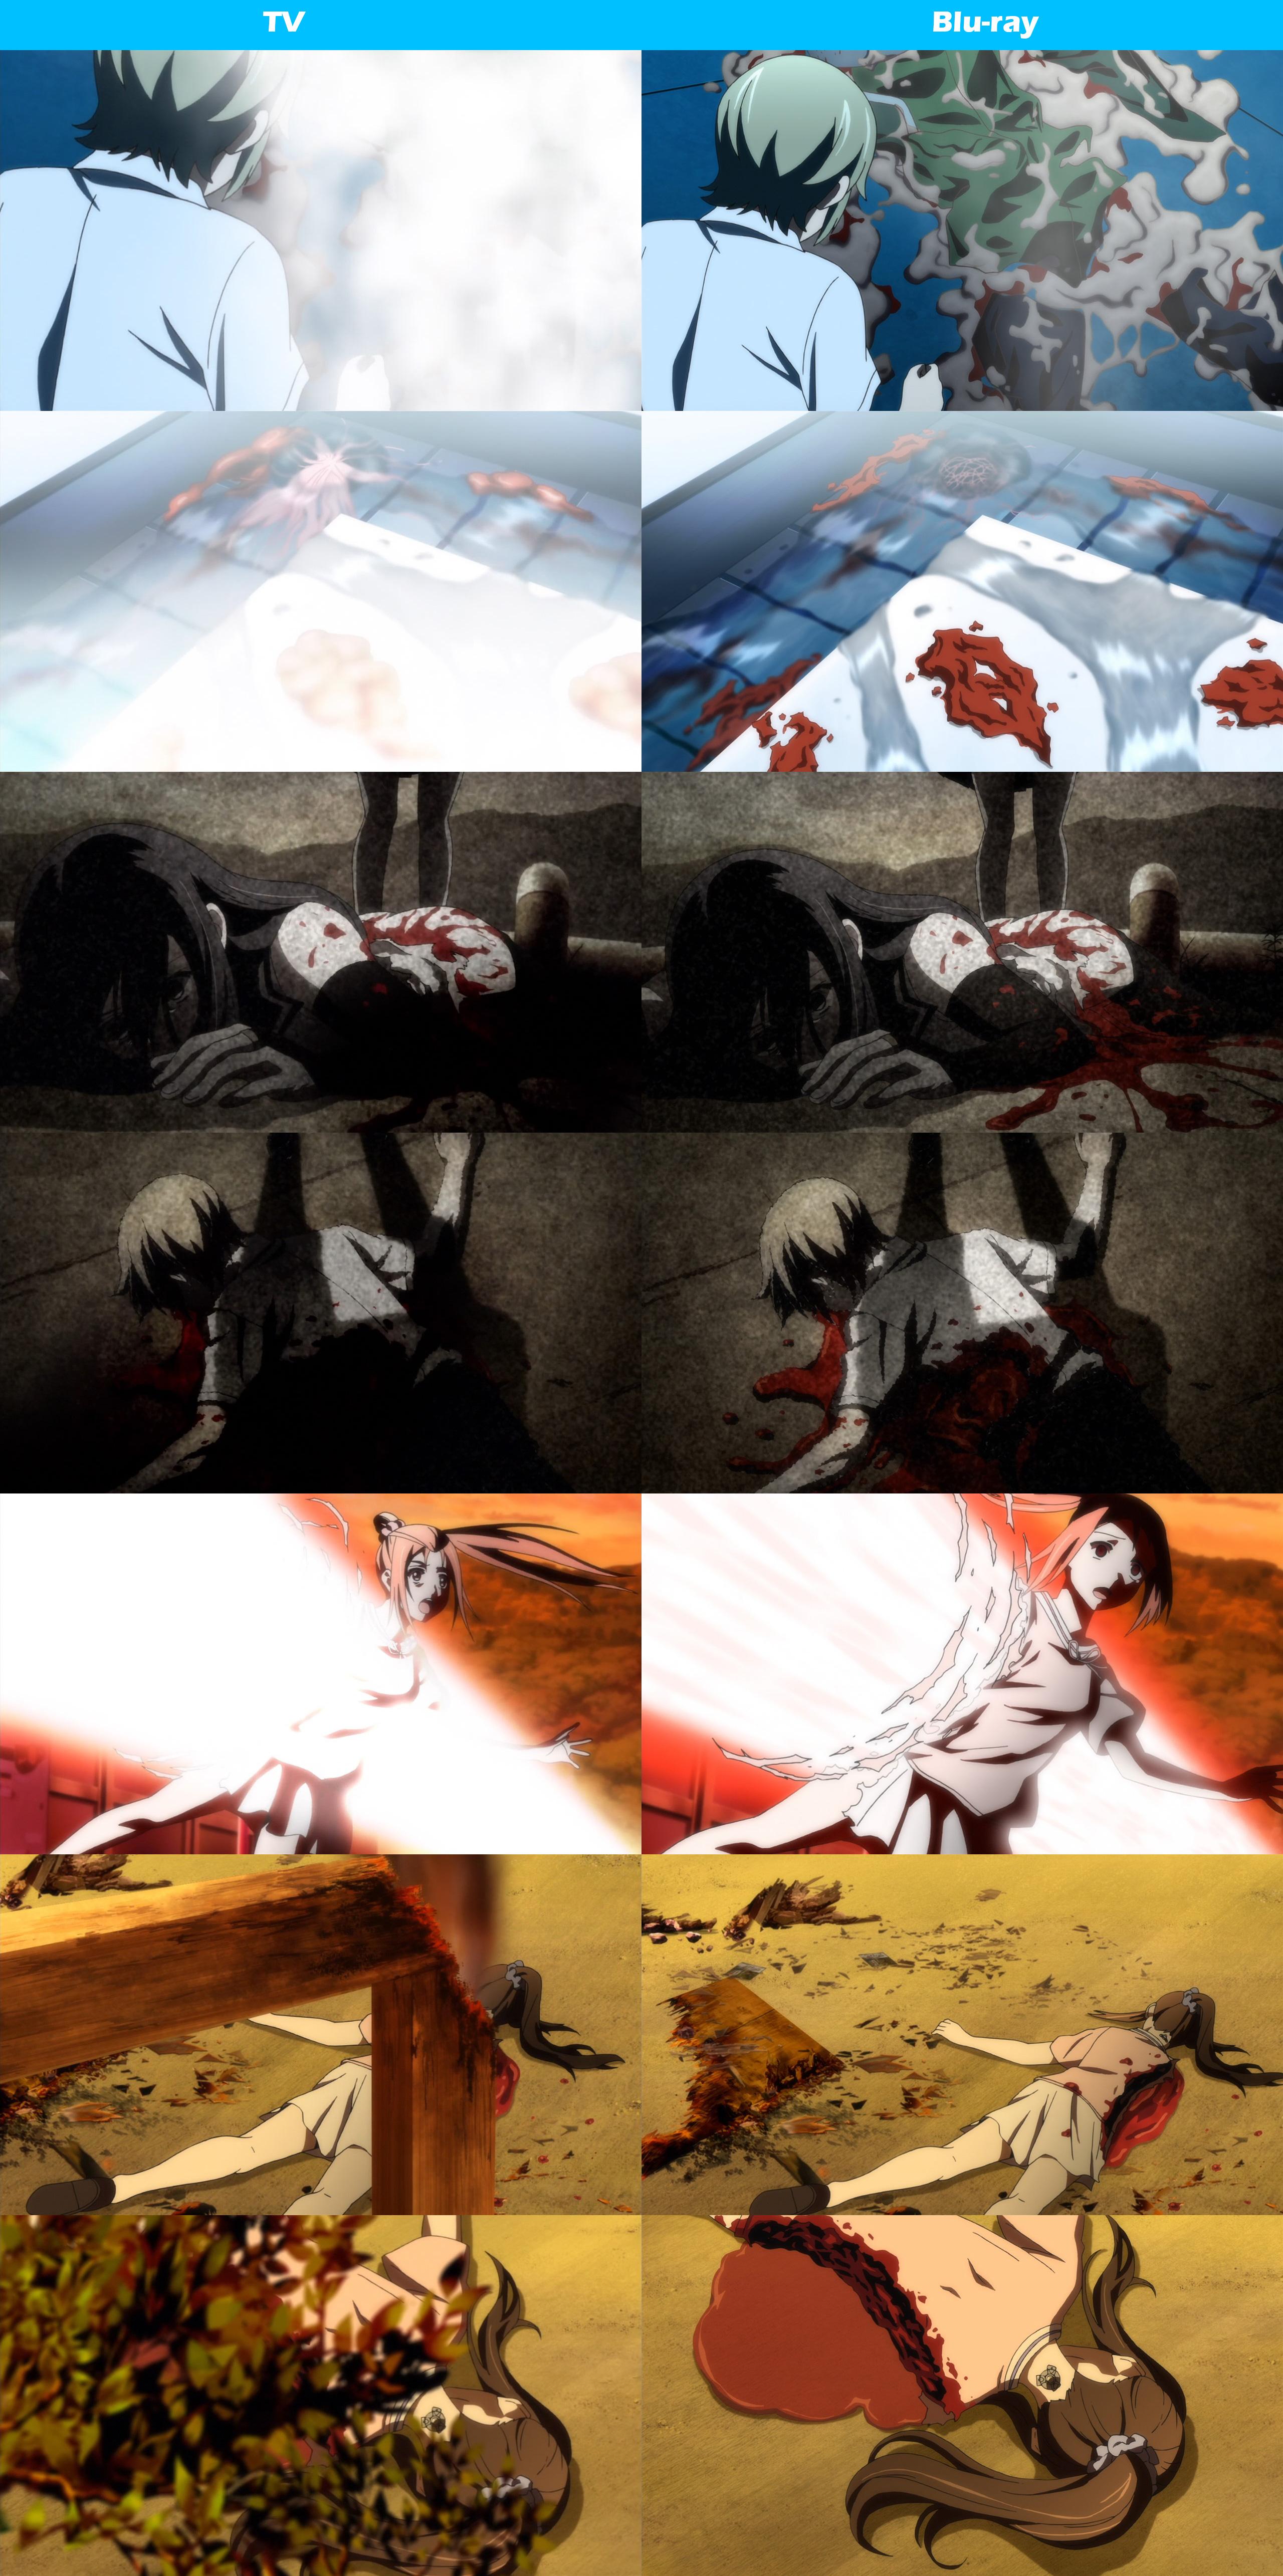 Gokukoku-no-Brynhildr-TV-and-Blu-ray-Comparisons-Gore-3_Haruhichan.com